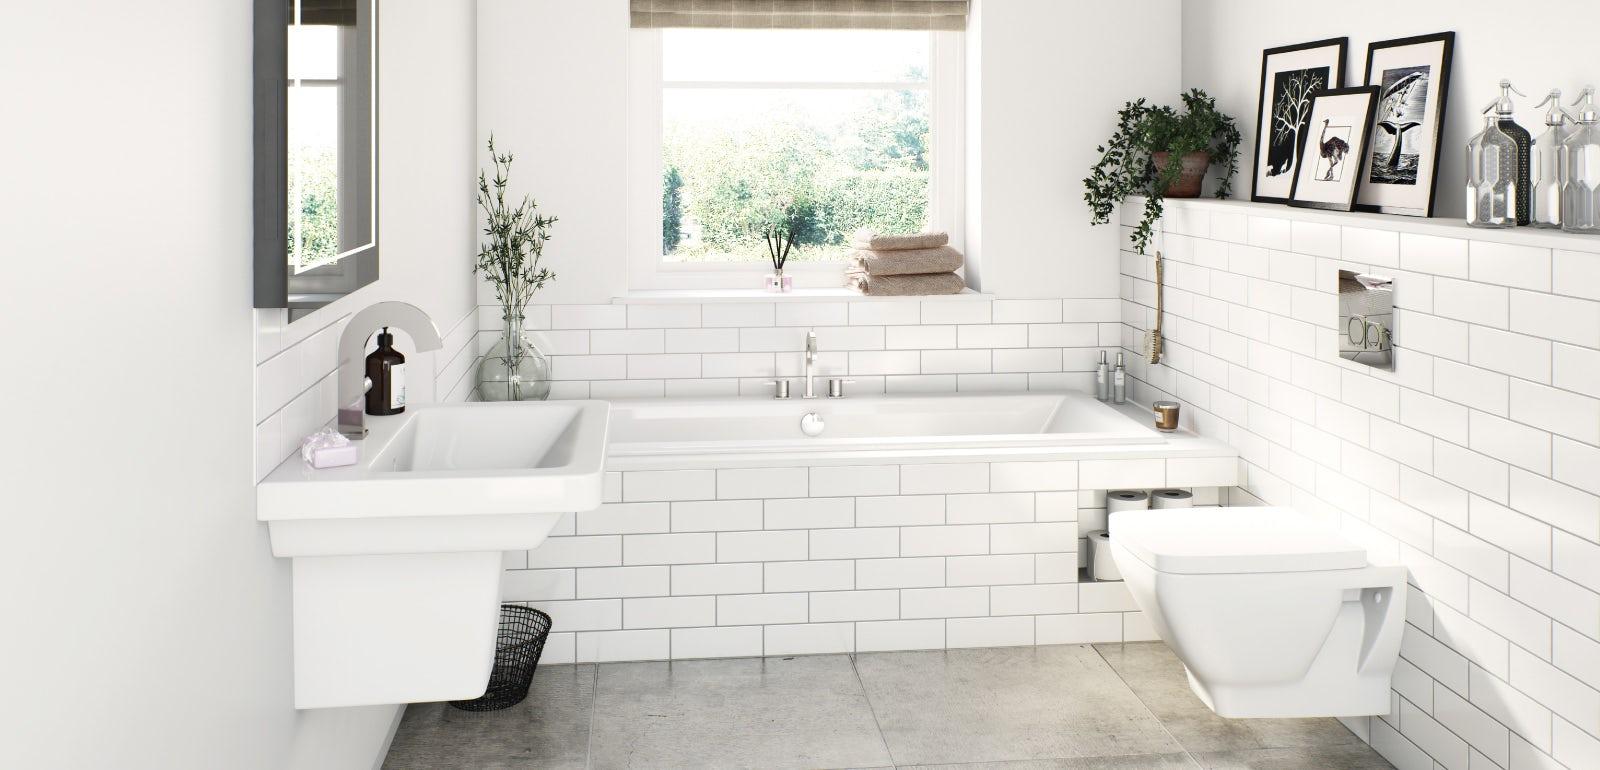 designer bathroom latest modern baths design modern bathroom spa stunning designer bathroom suites of the best with designer bathroom